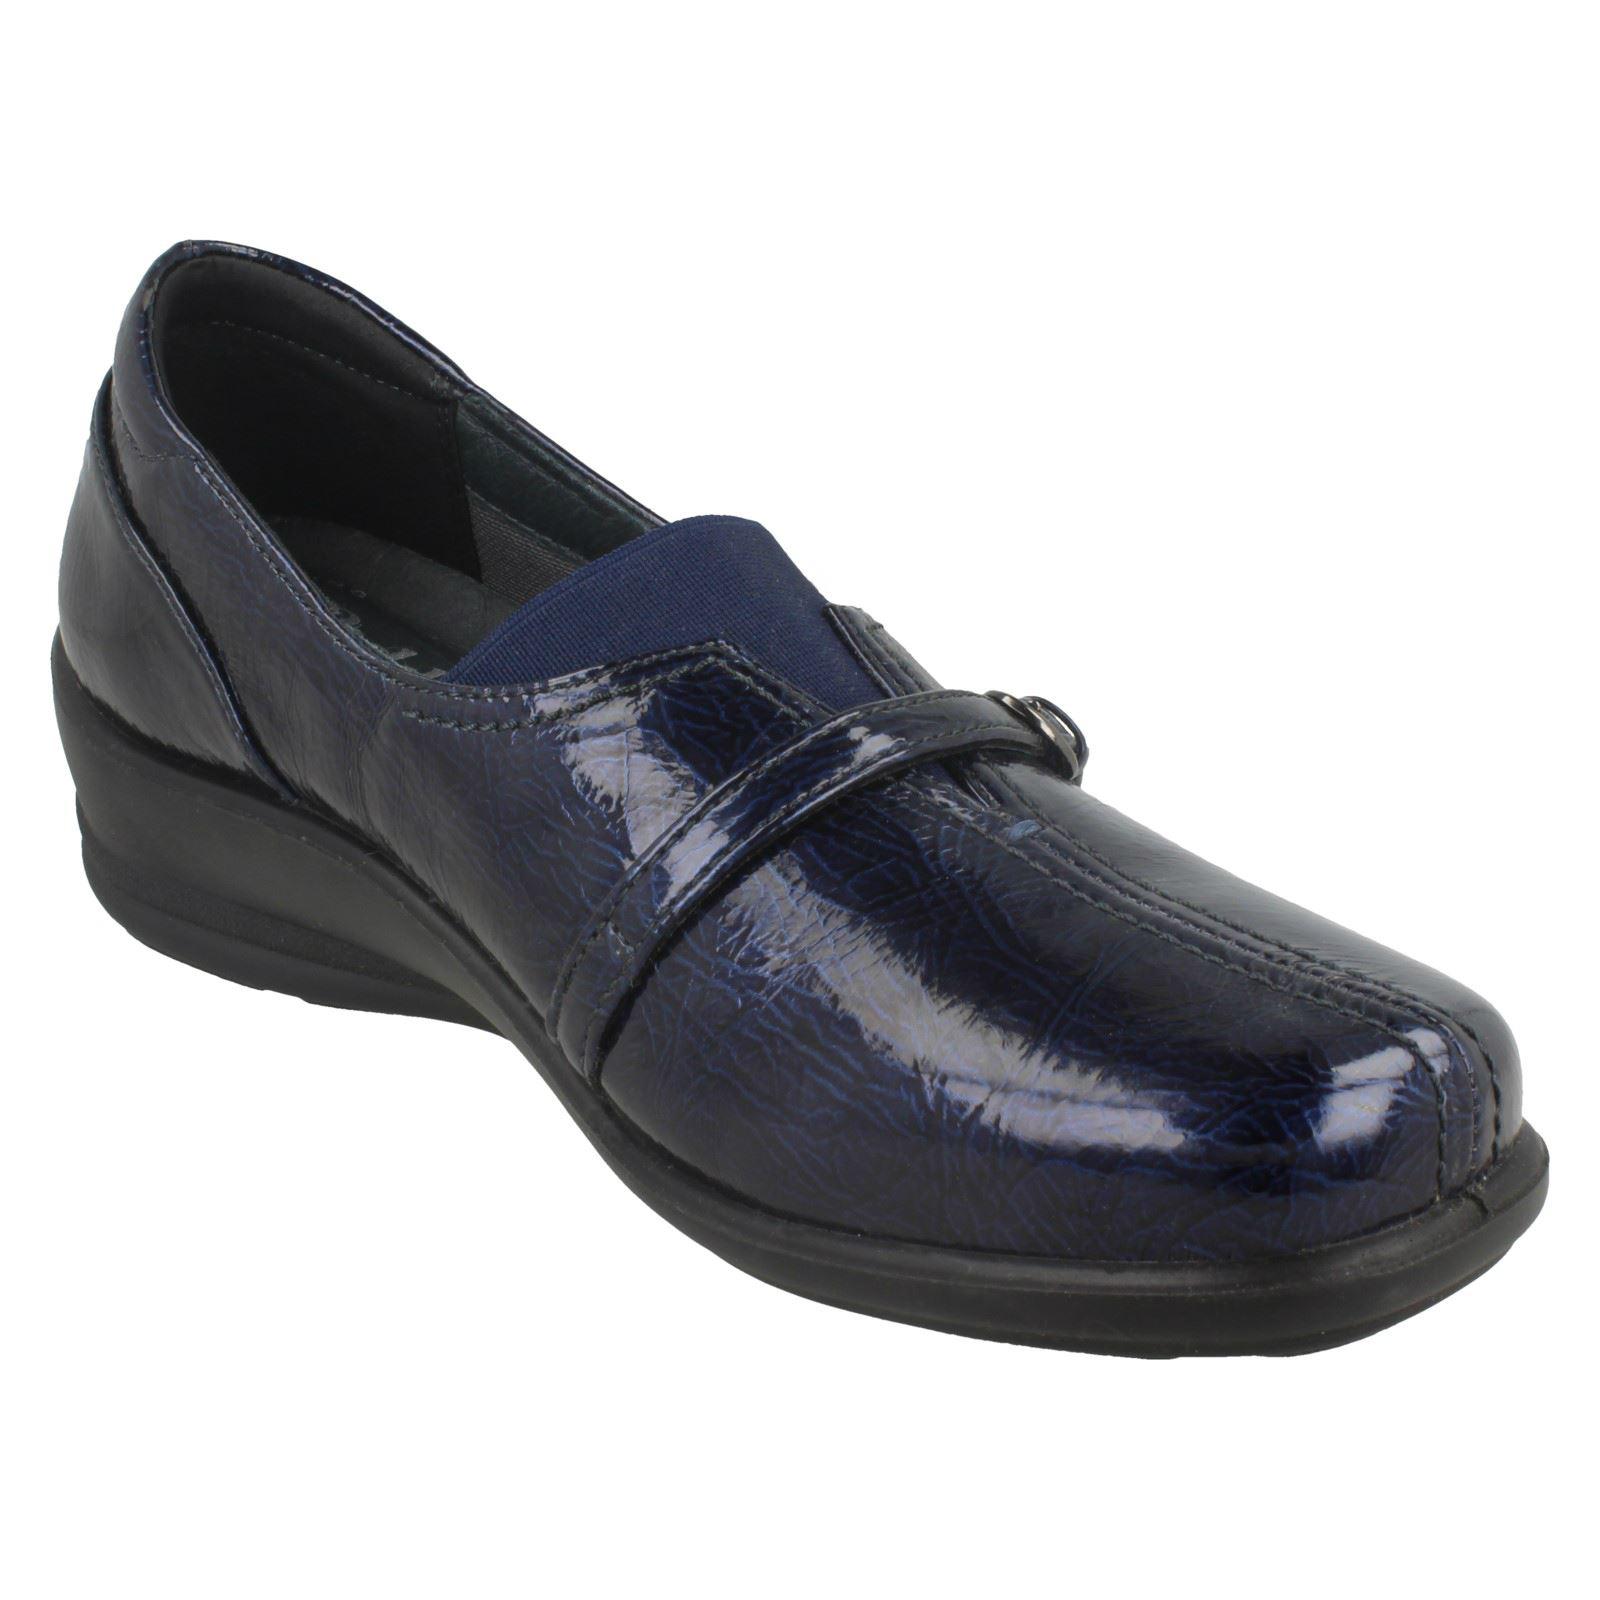 Padders Ladies Ladies Ladies Dual Fit System Comfort Flats Shelley ac6fb8